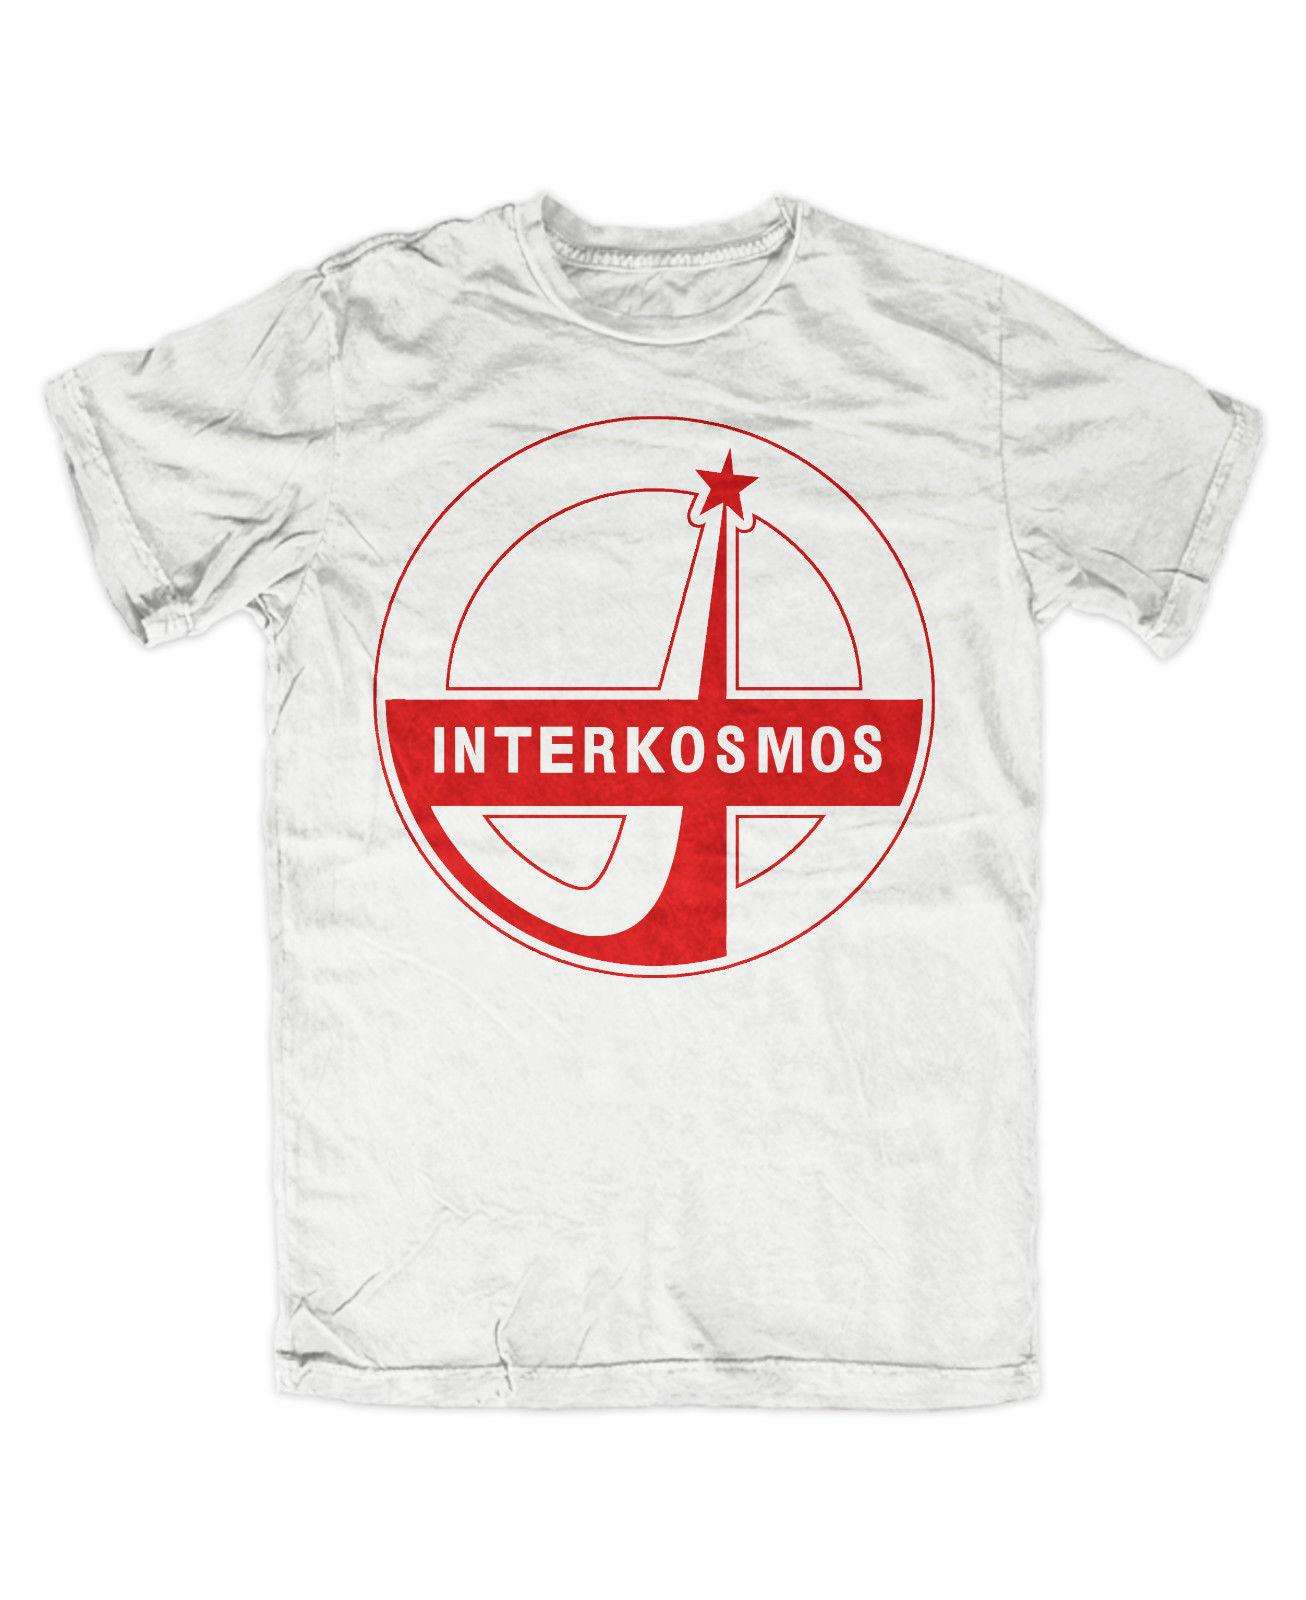 c7c3d5425fc Details Zu Interkosmos T Shirt WEISS UDSSR,Russia,Retro,Kult,Ost,DDR,CCCP,Kosmonaut  Funny Unisex Casual Gift T Shirt Shop Design Crazy T Shirts Online From ...